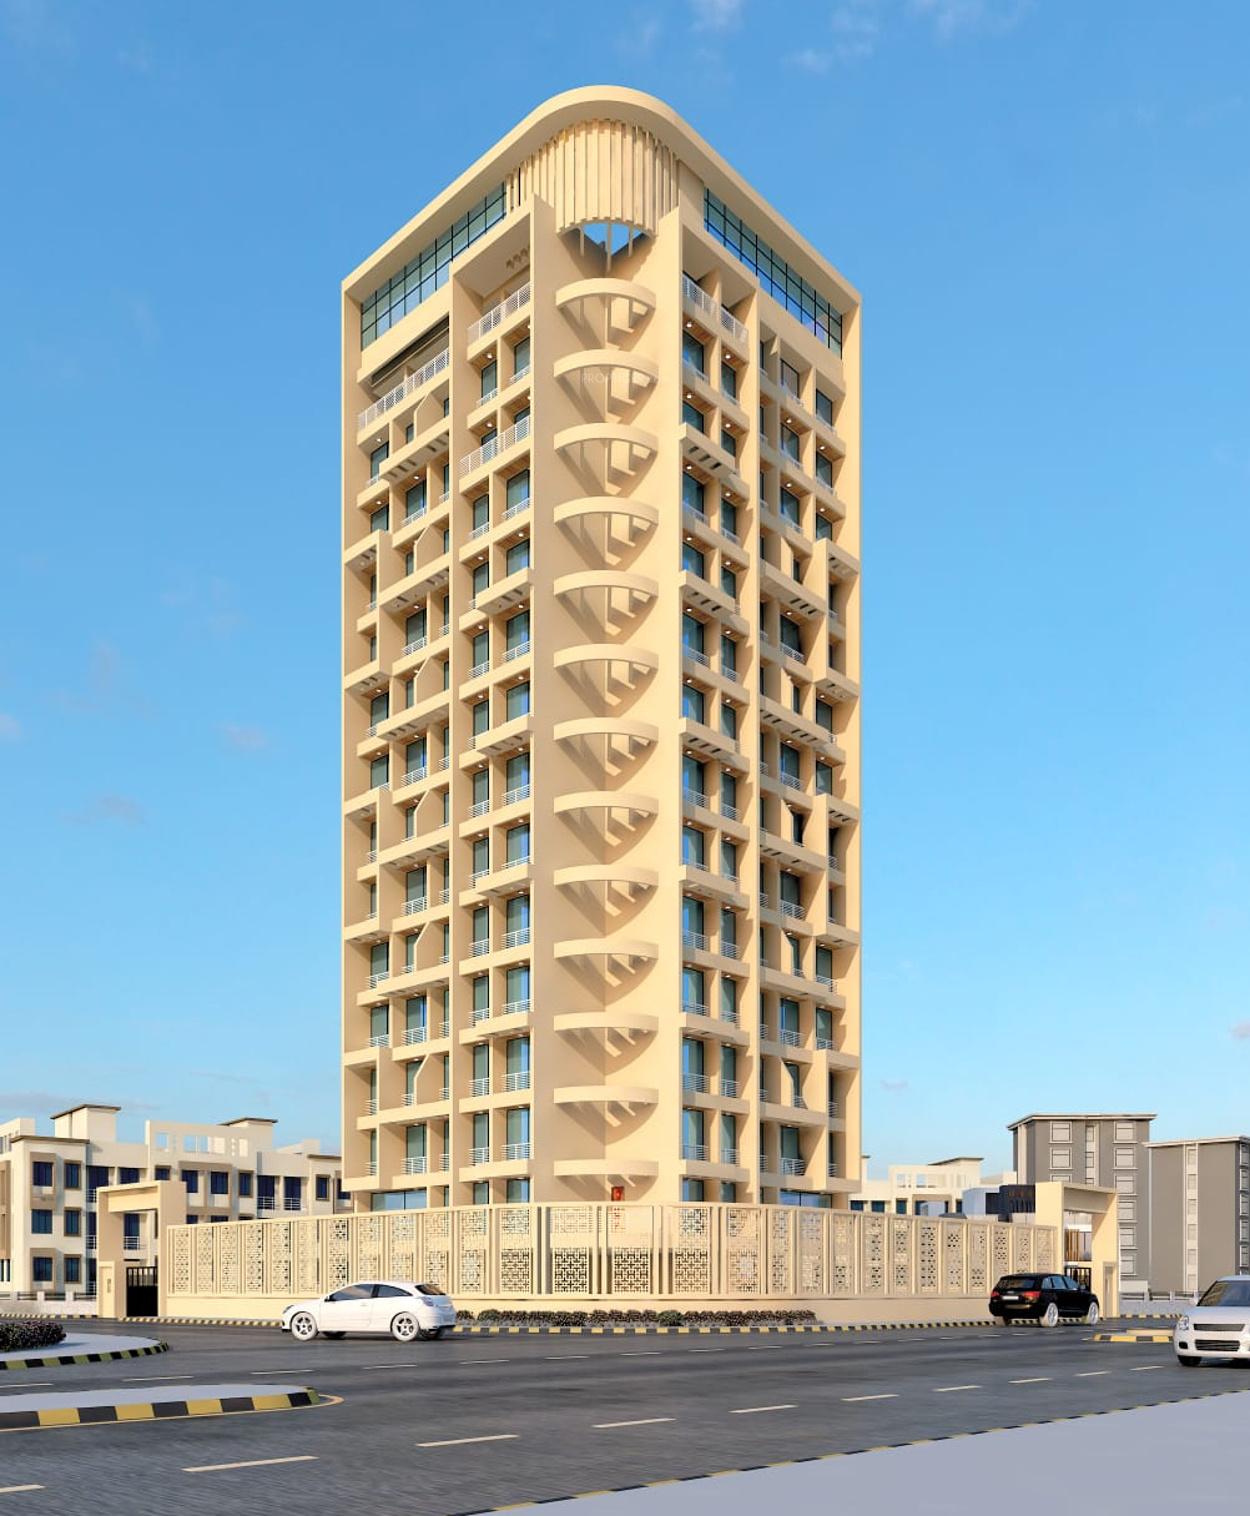 Affordable Flats in Kharghar Mumbai - Buy Affordable